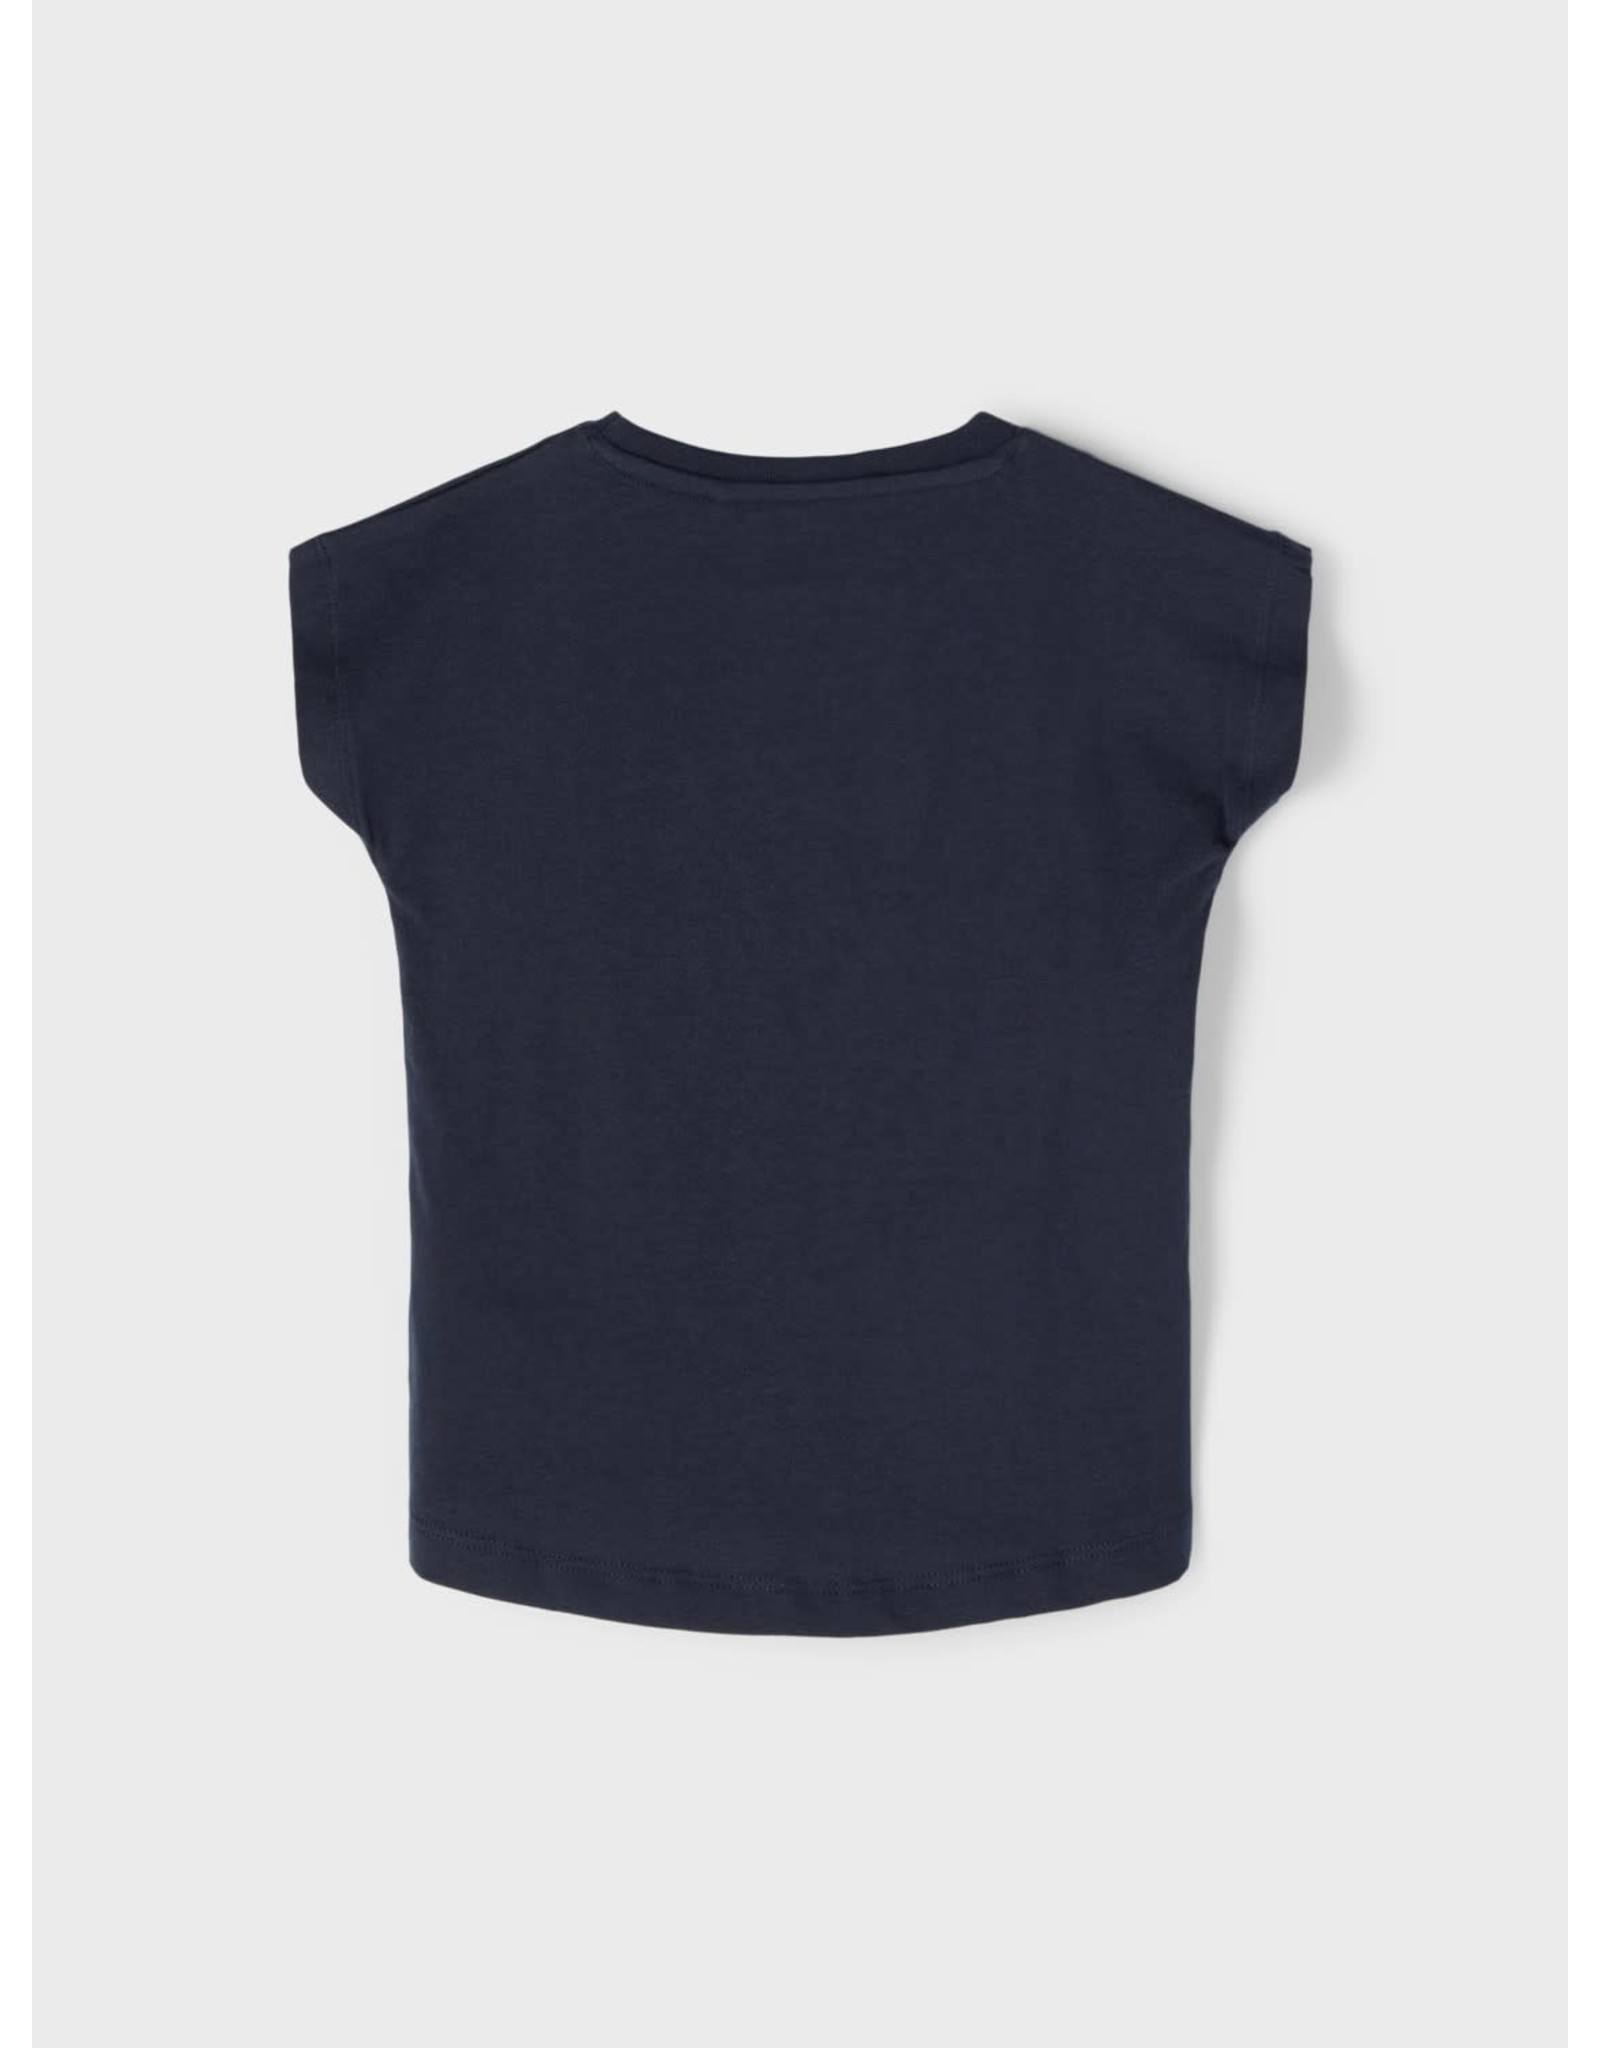 Name It Basis blauwe bedrukte t-shirt voor kleine meisjes